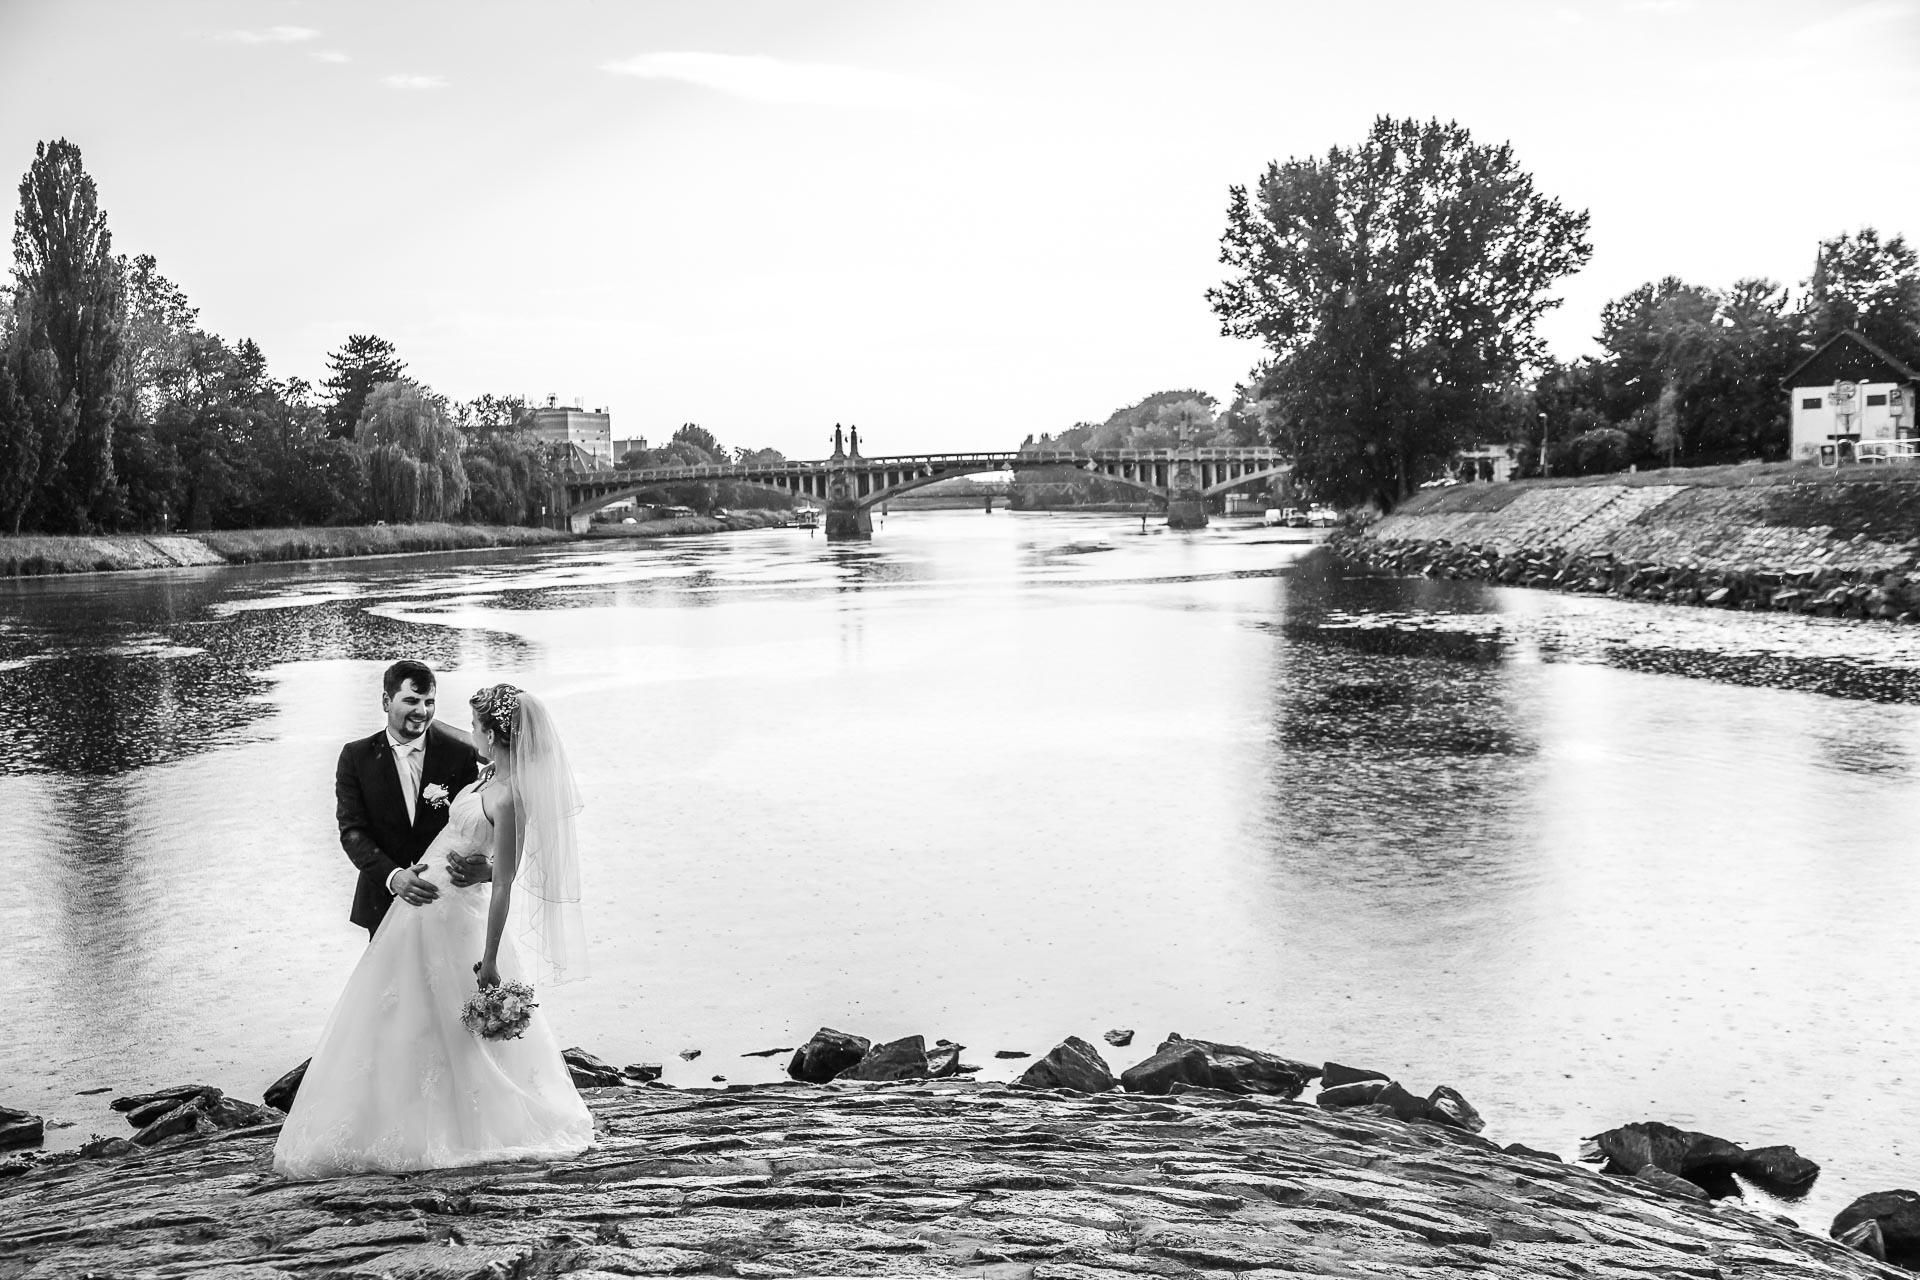 Svatební-fotograf-Nymburk-6233